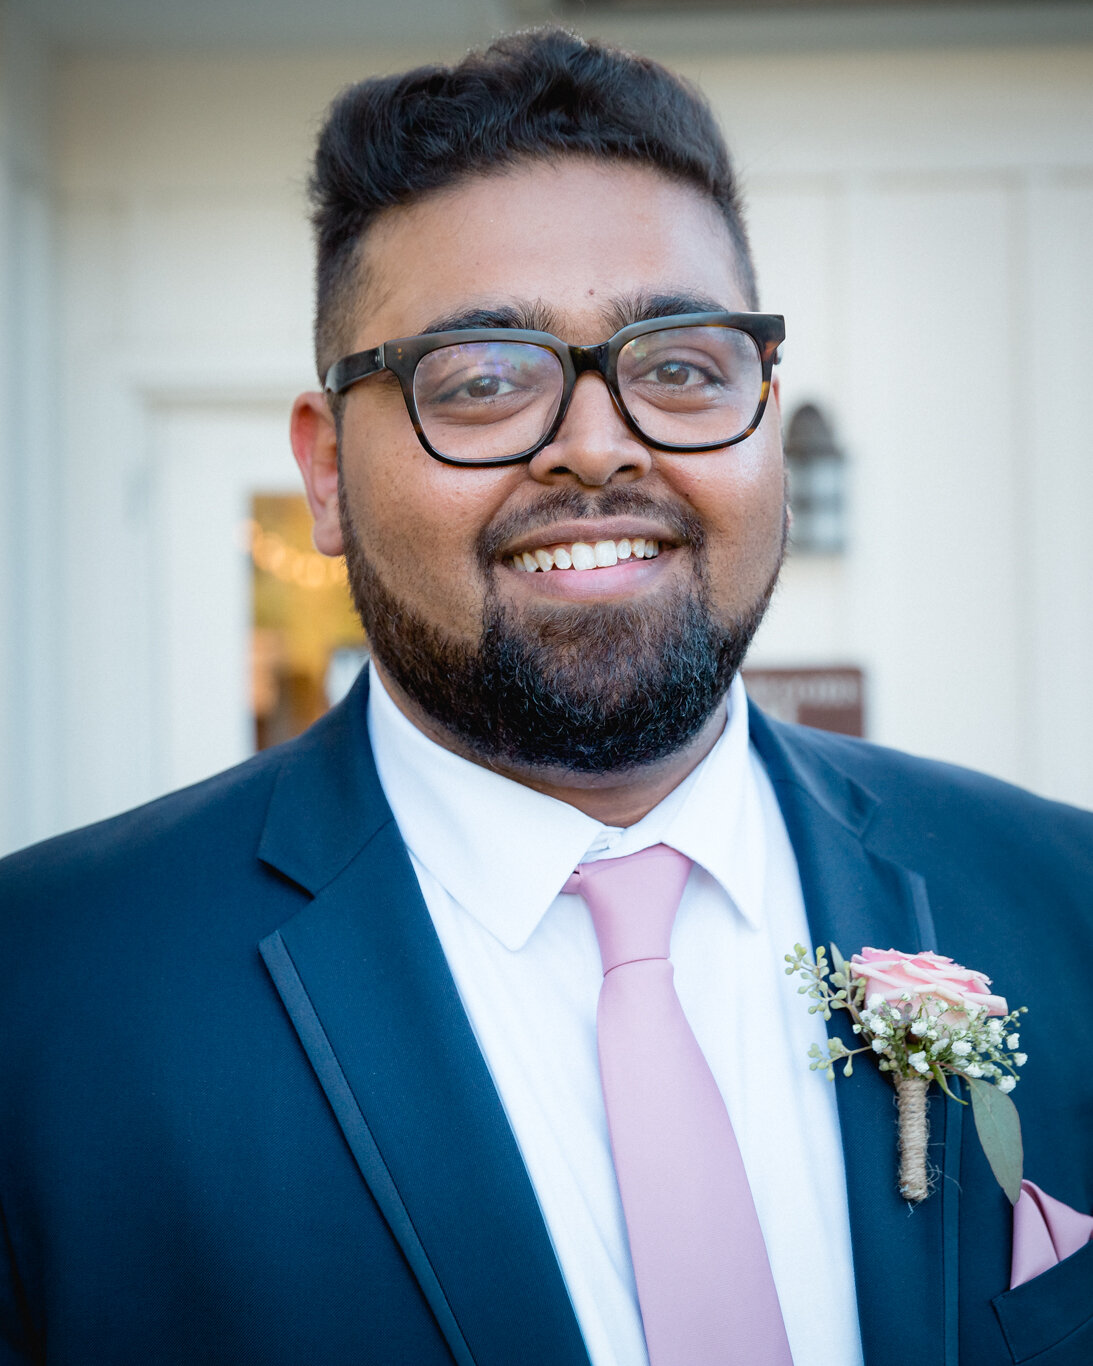 2019.08.24_Emily-Ashir-Wedding-at-the-Maples-6116.jpg